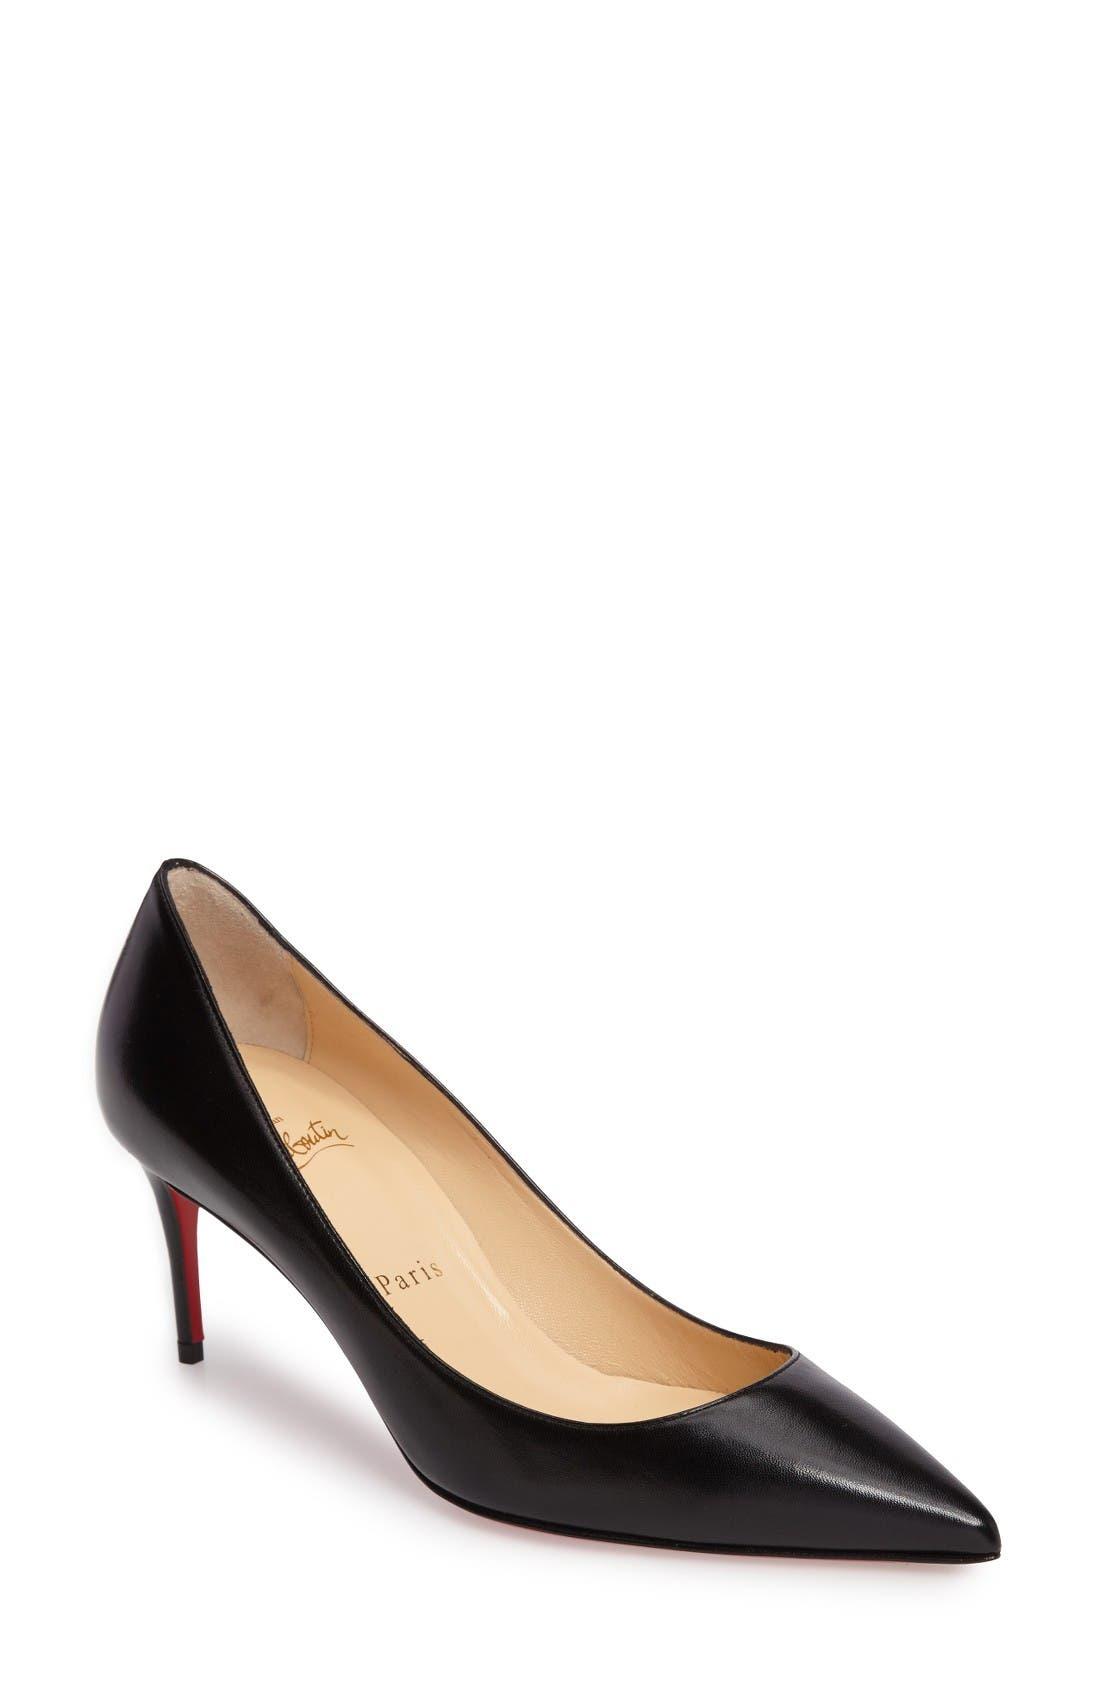 'Decollette' Pointy Toe Pump,                         Main,                         color, Black Leather